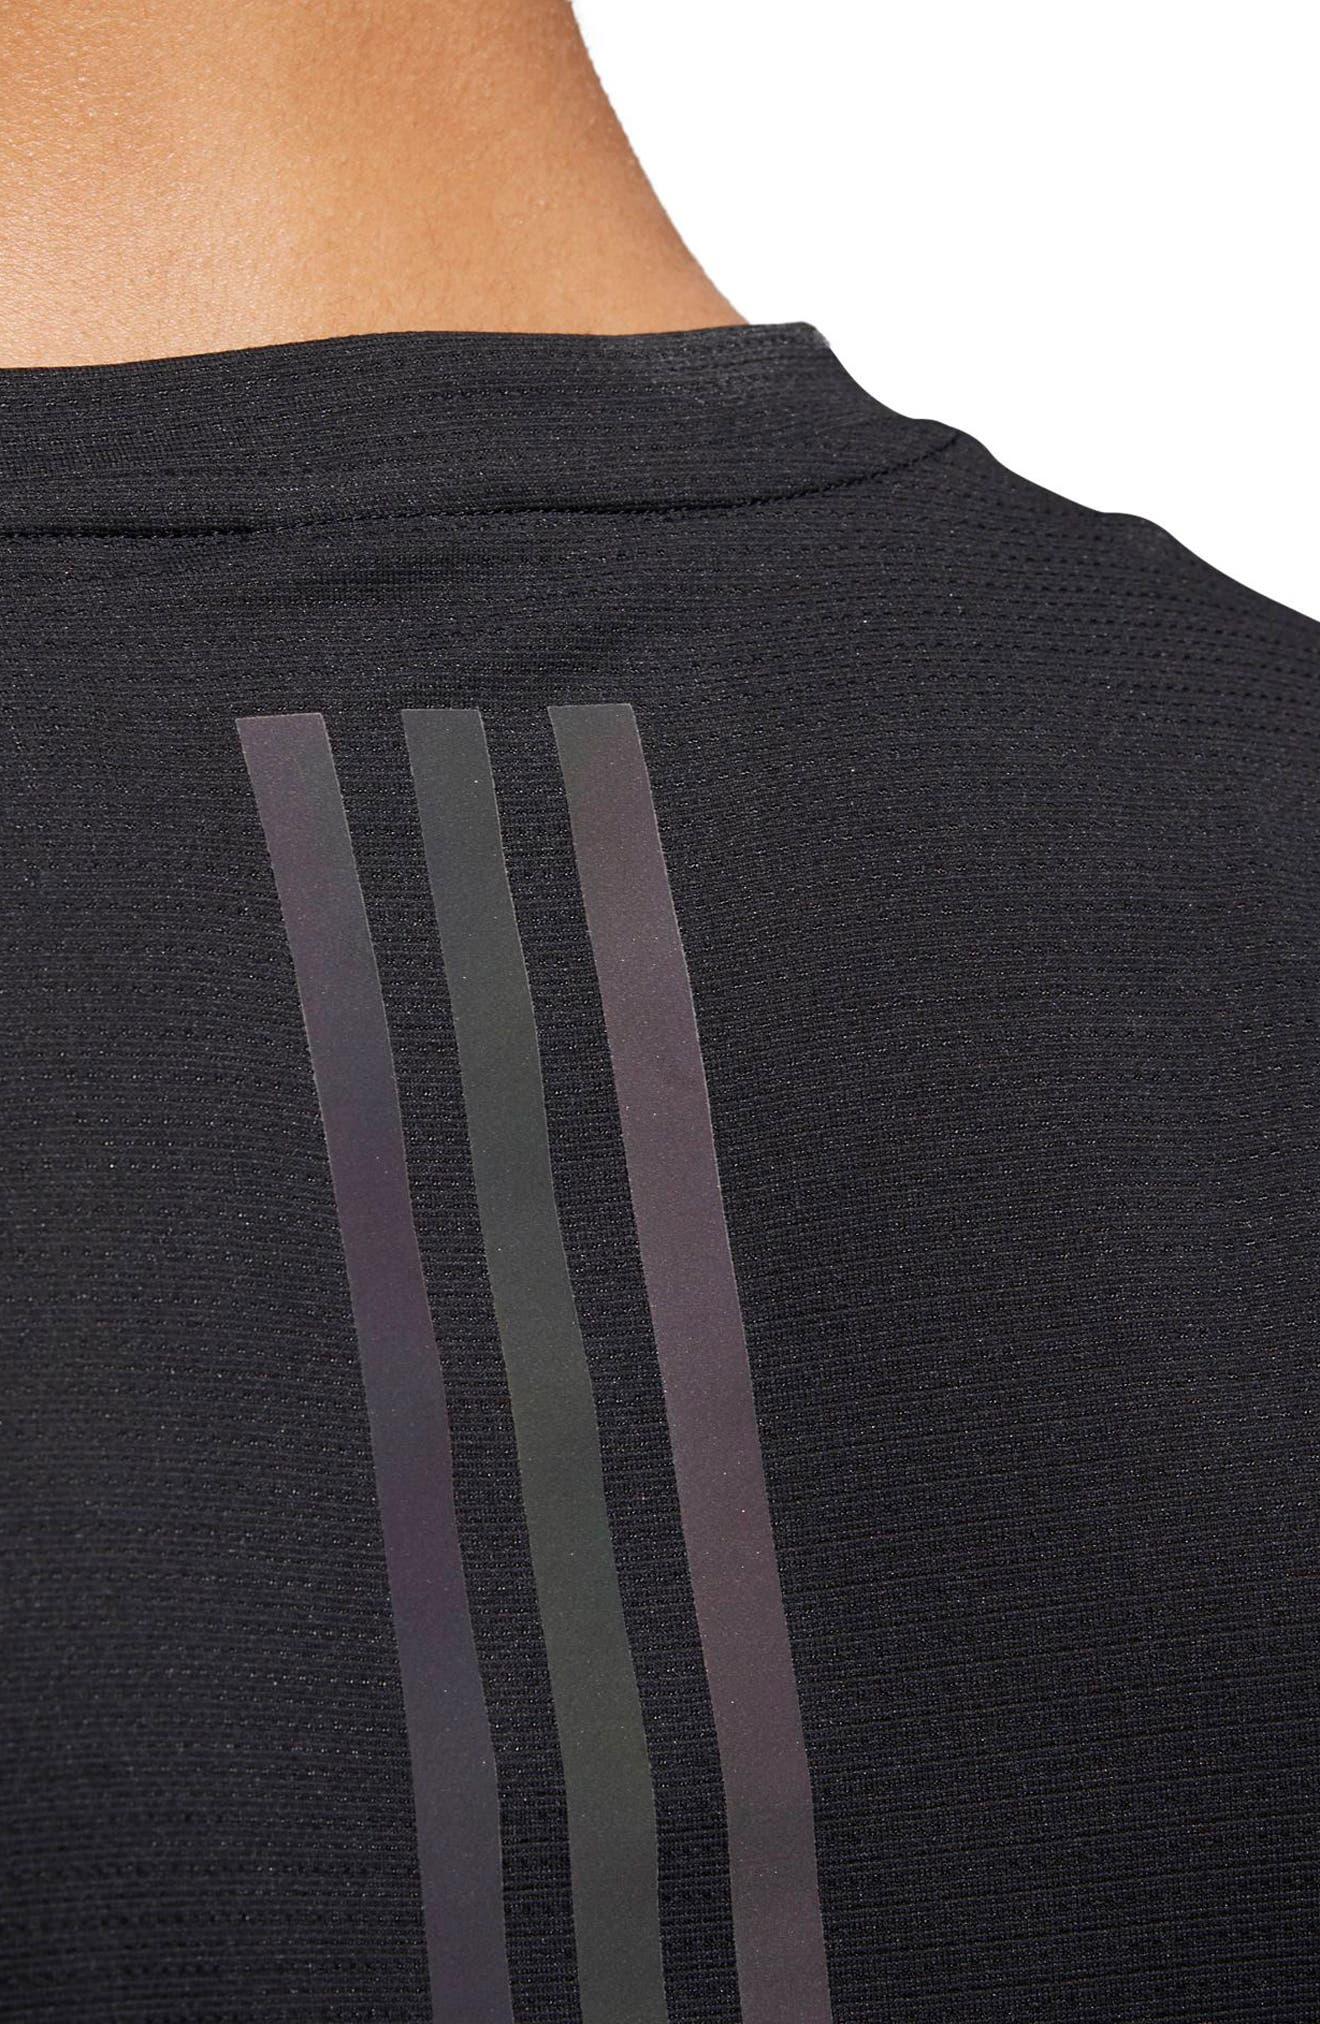 Supernova Regular Fit Short Sleeve Reflective Running T-Shirt,                             Alternate thumbnail 4, color,                             BLACK